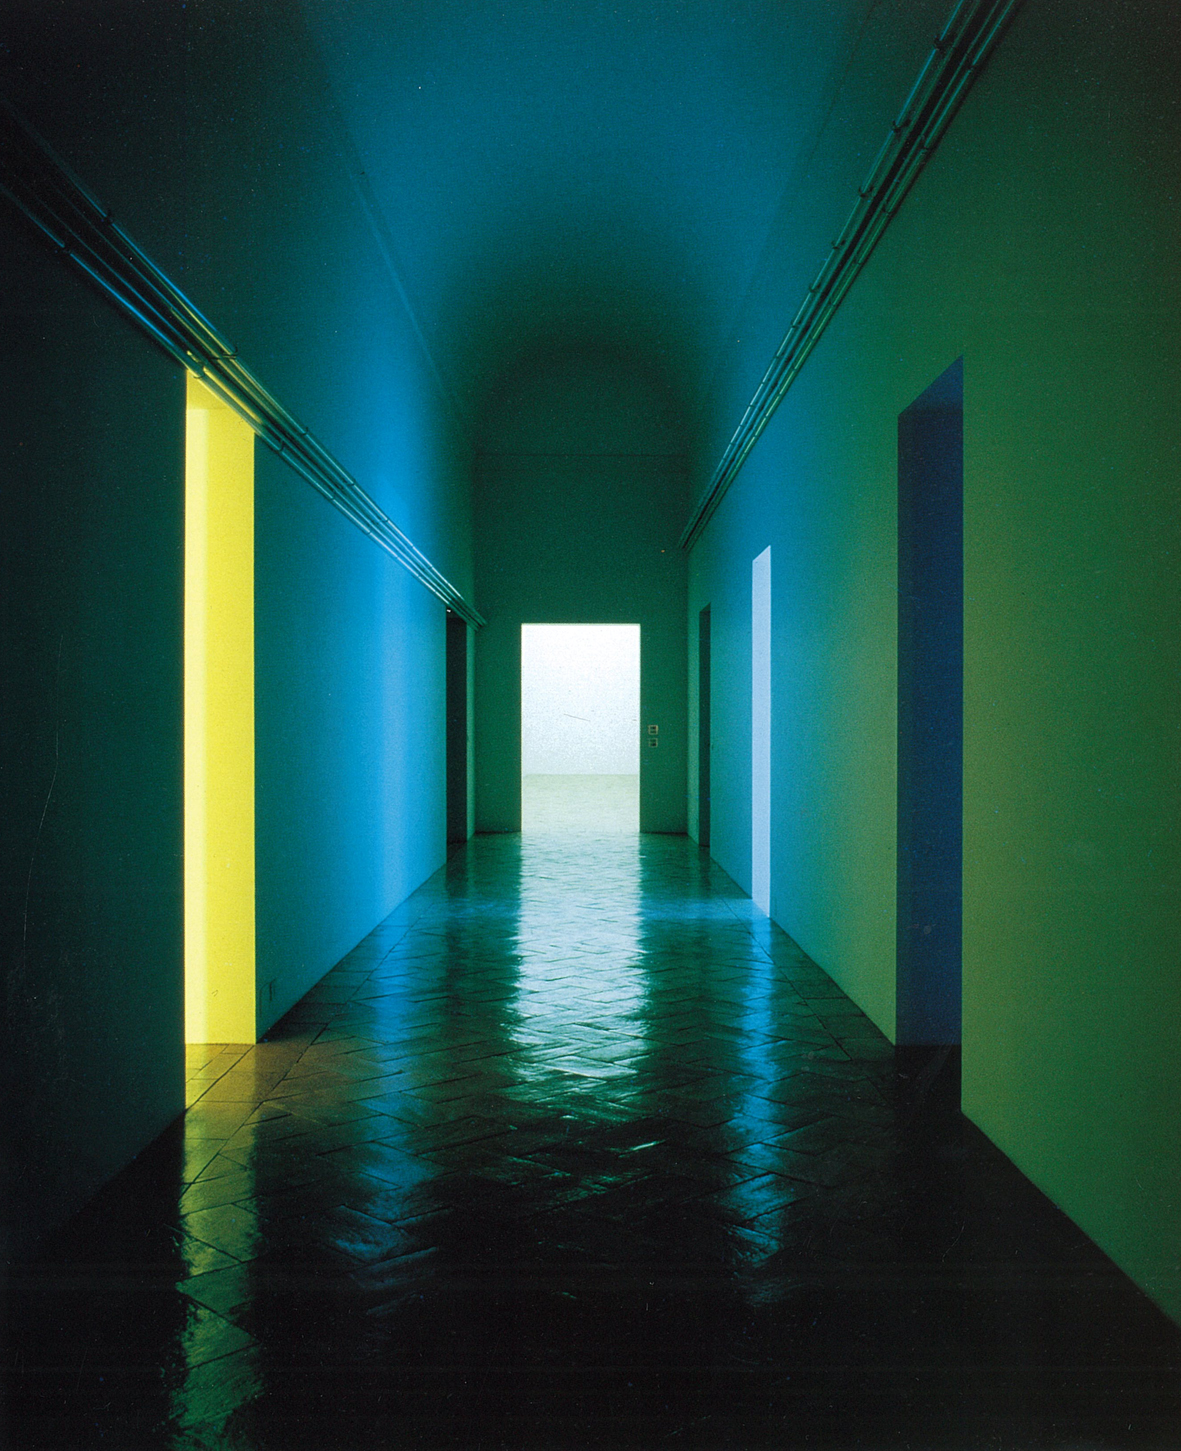 SARC 323 Colour, Pattern, Light: Dan Flavin, 1976, Varese ...